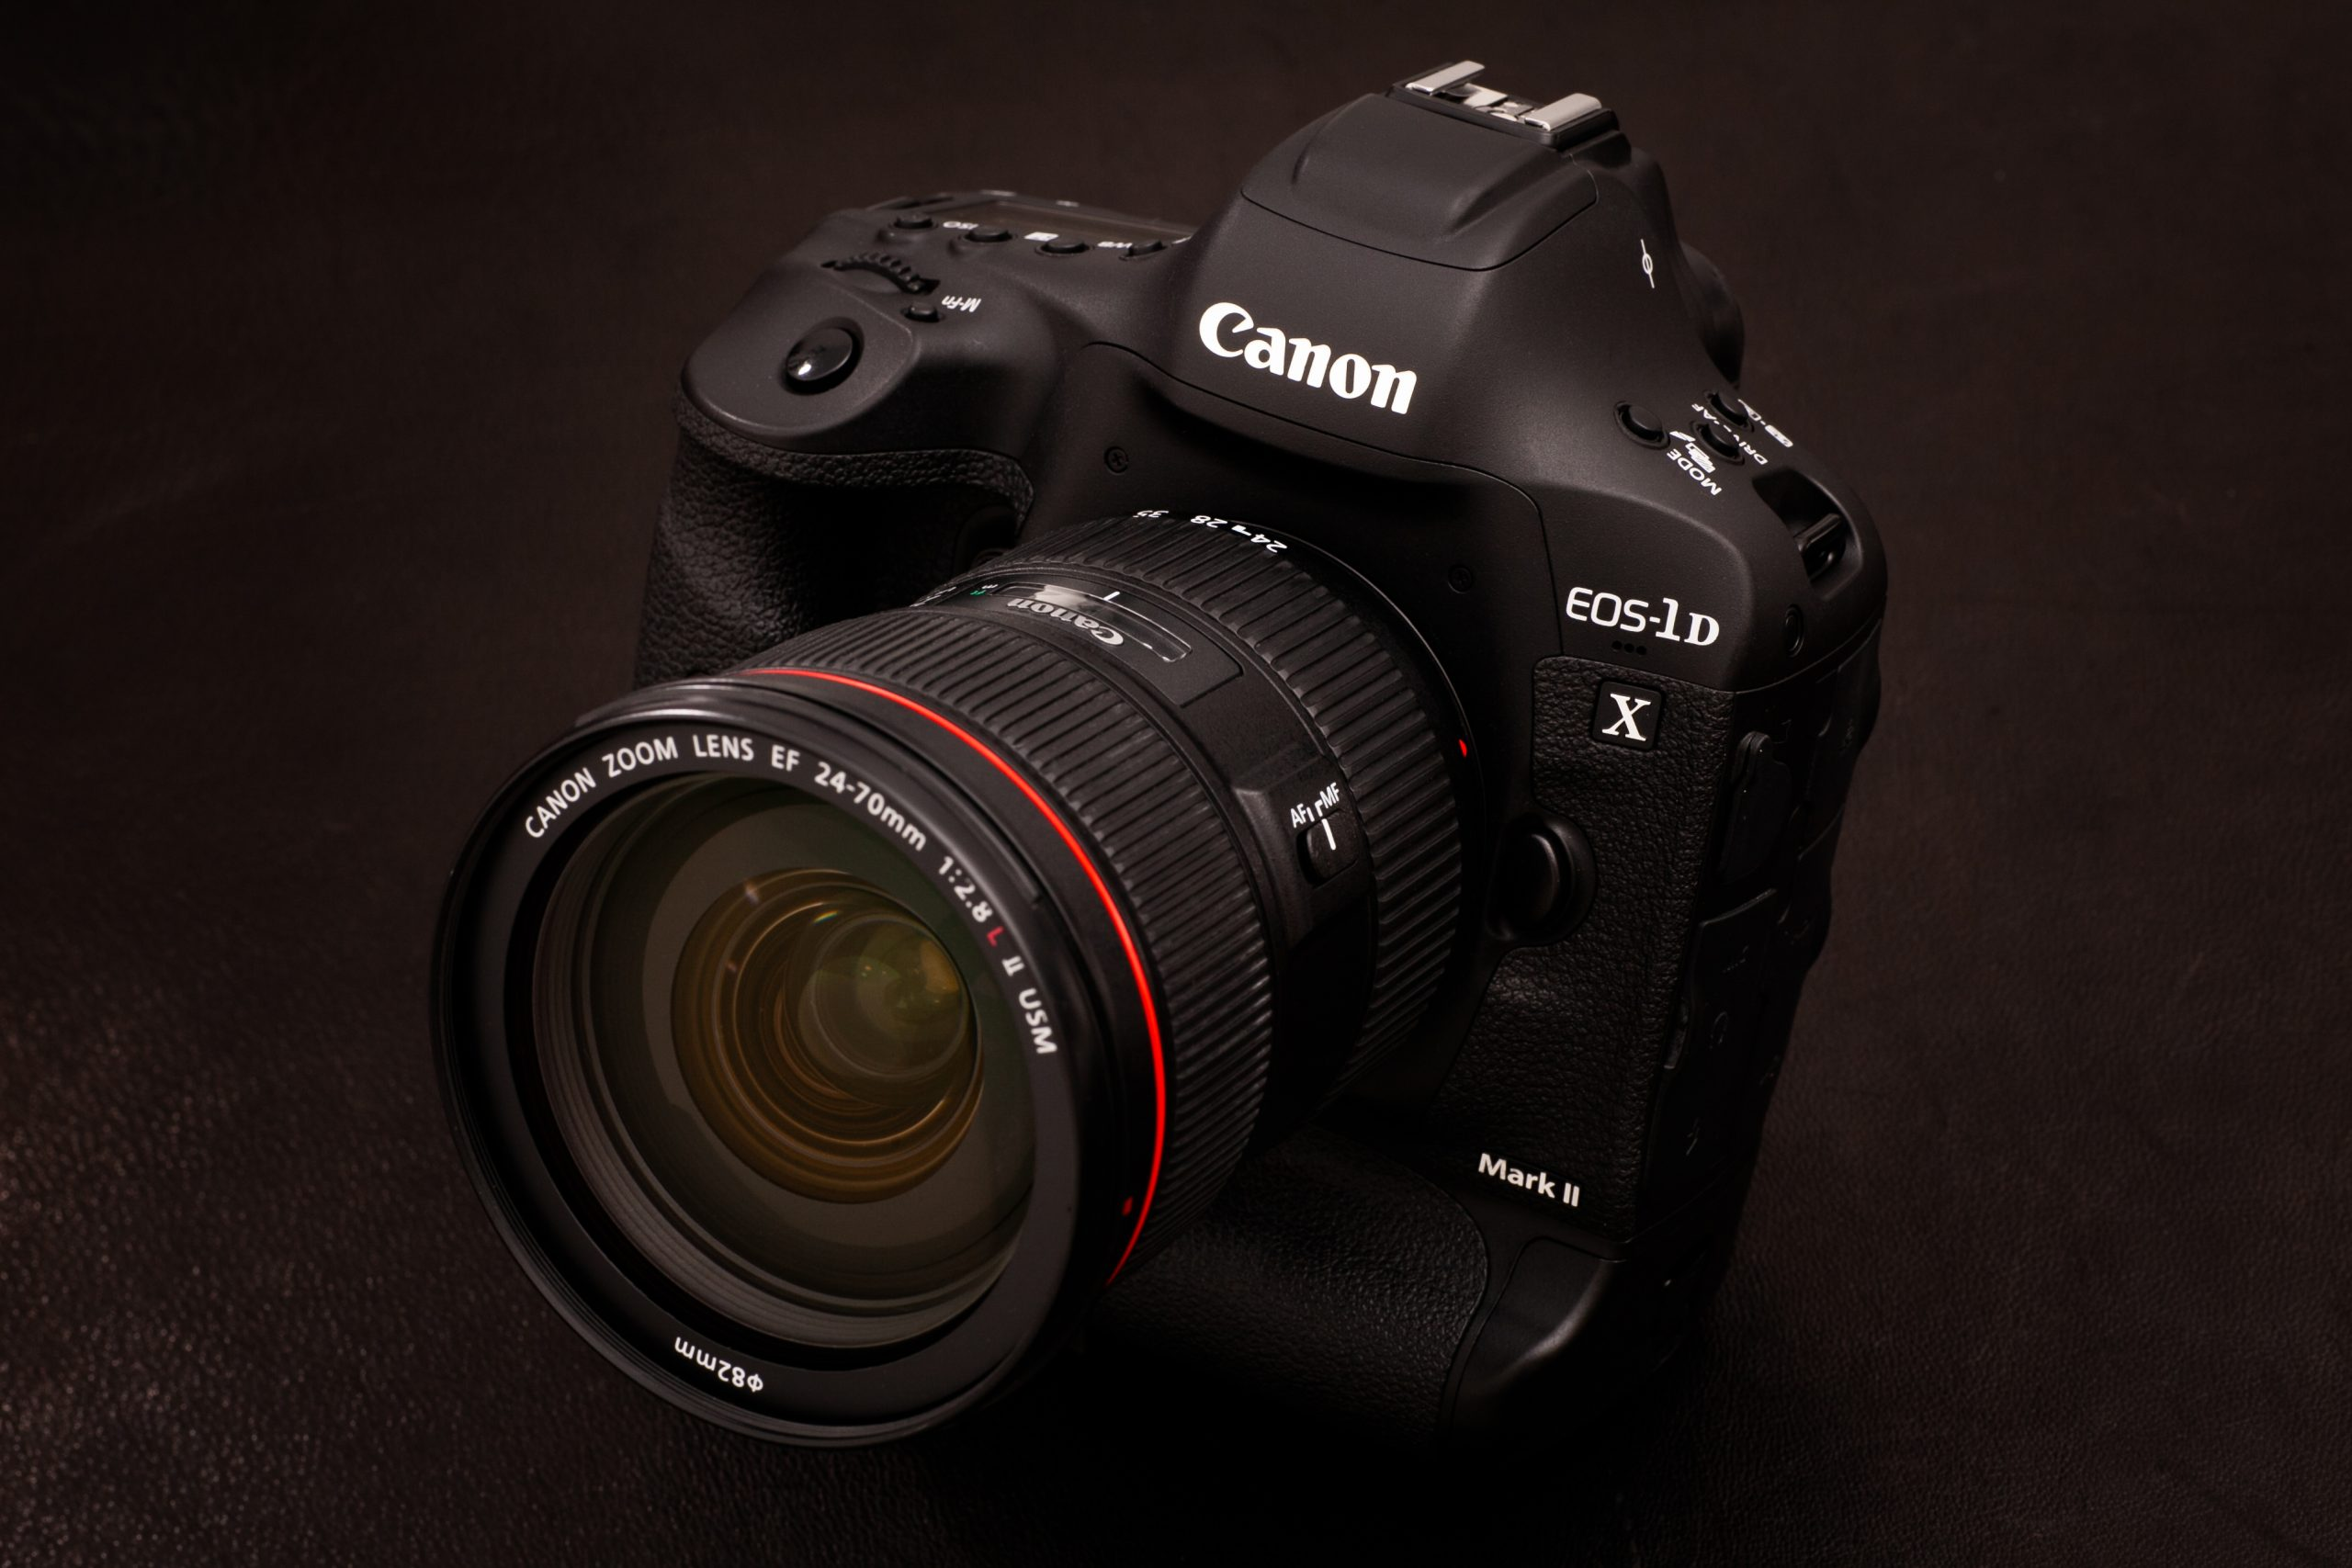 【Canon】色んなカメラでシャッター音聞き比べ | 6DMarkII 5Ds 1DXMarkII